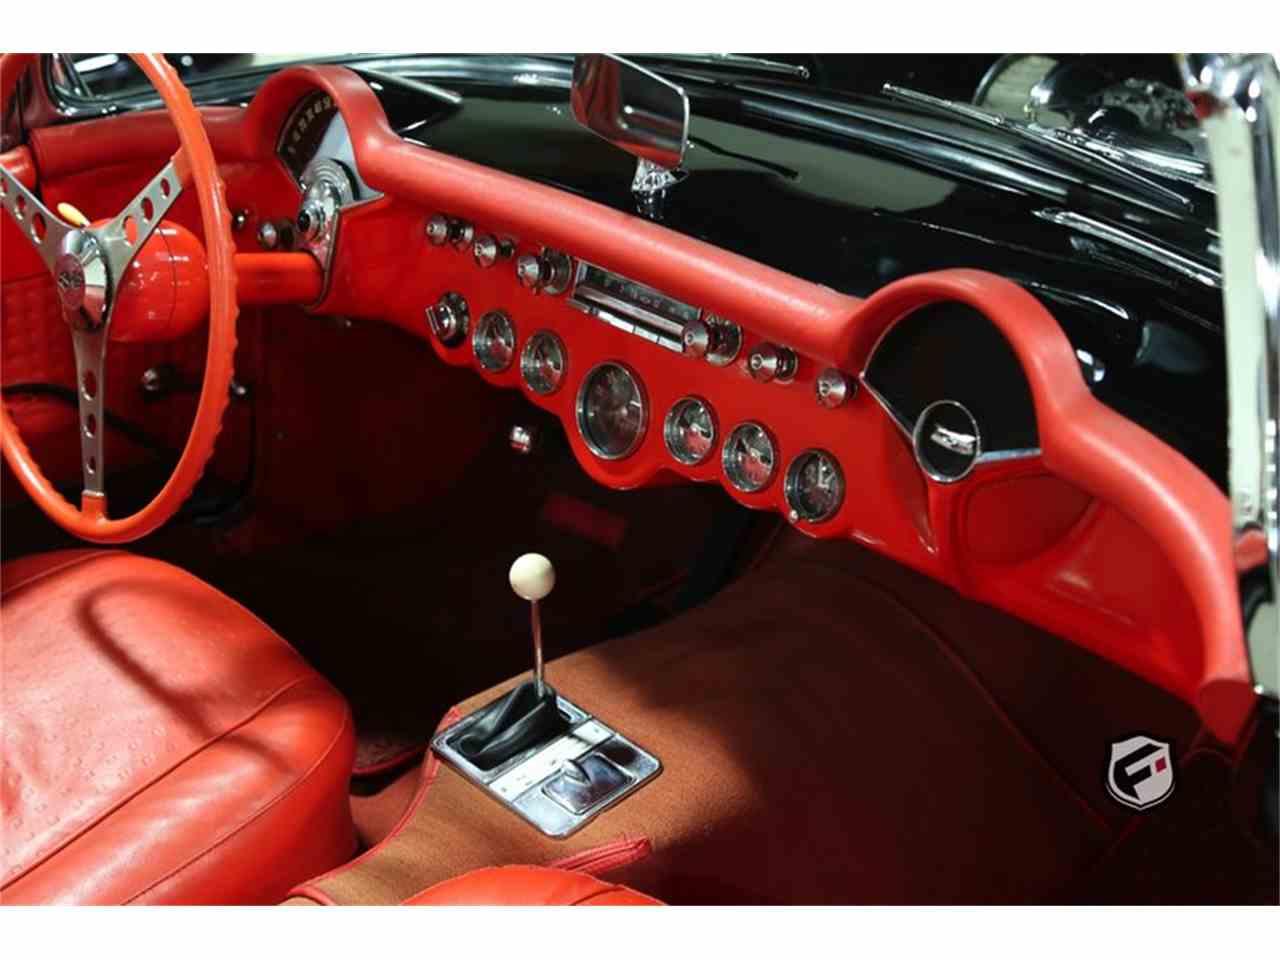 Large Picture of Classic 1957 Chevrolet Corvette located in California - $99,900.00 - MBTJ